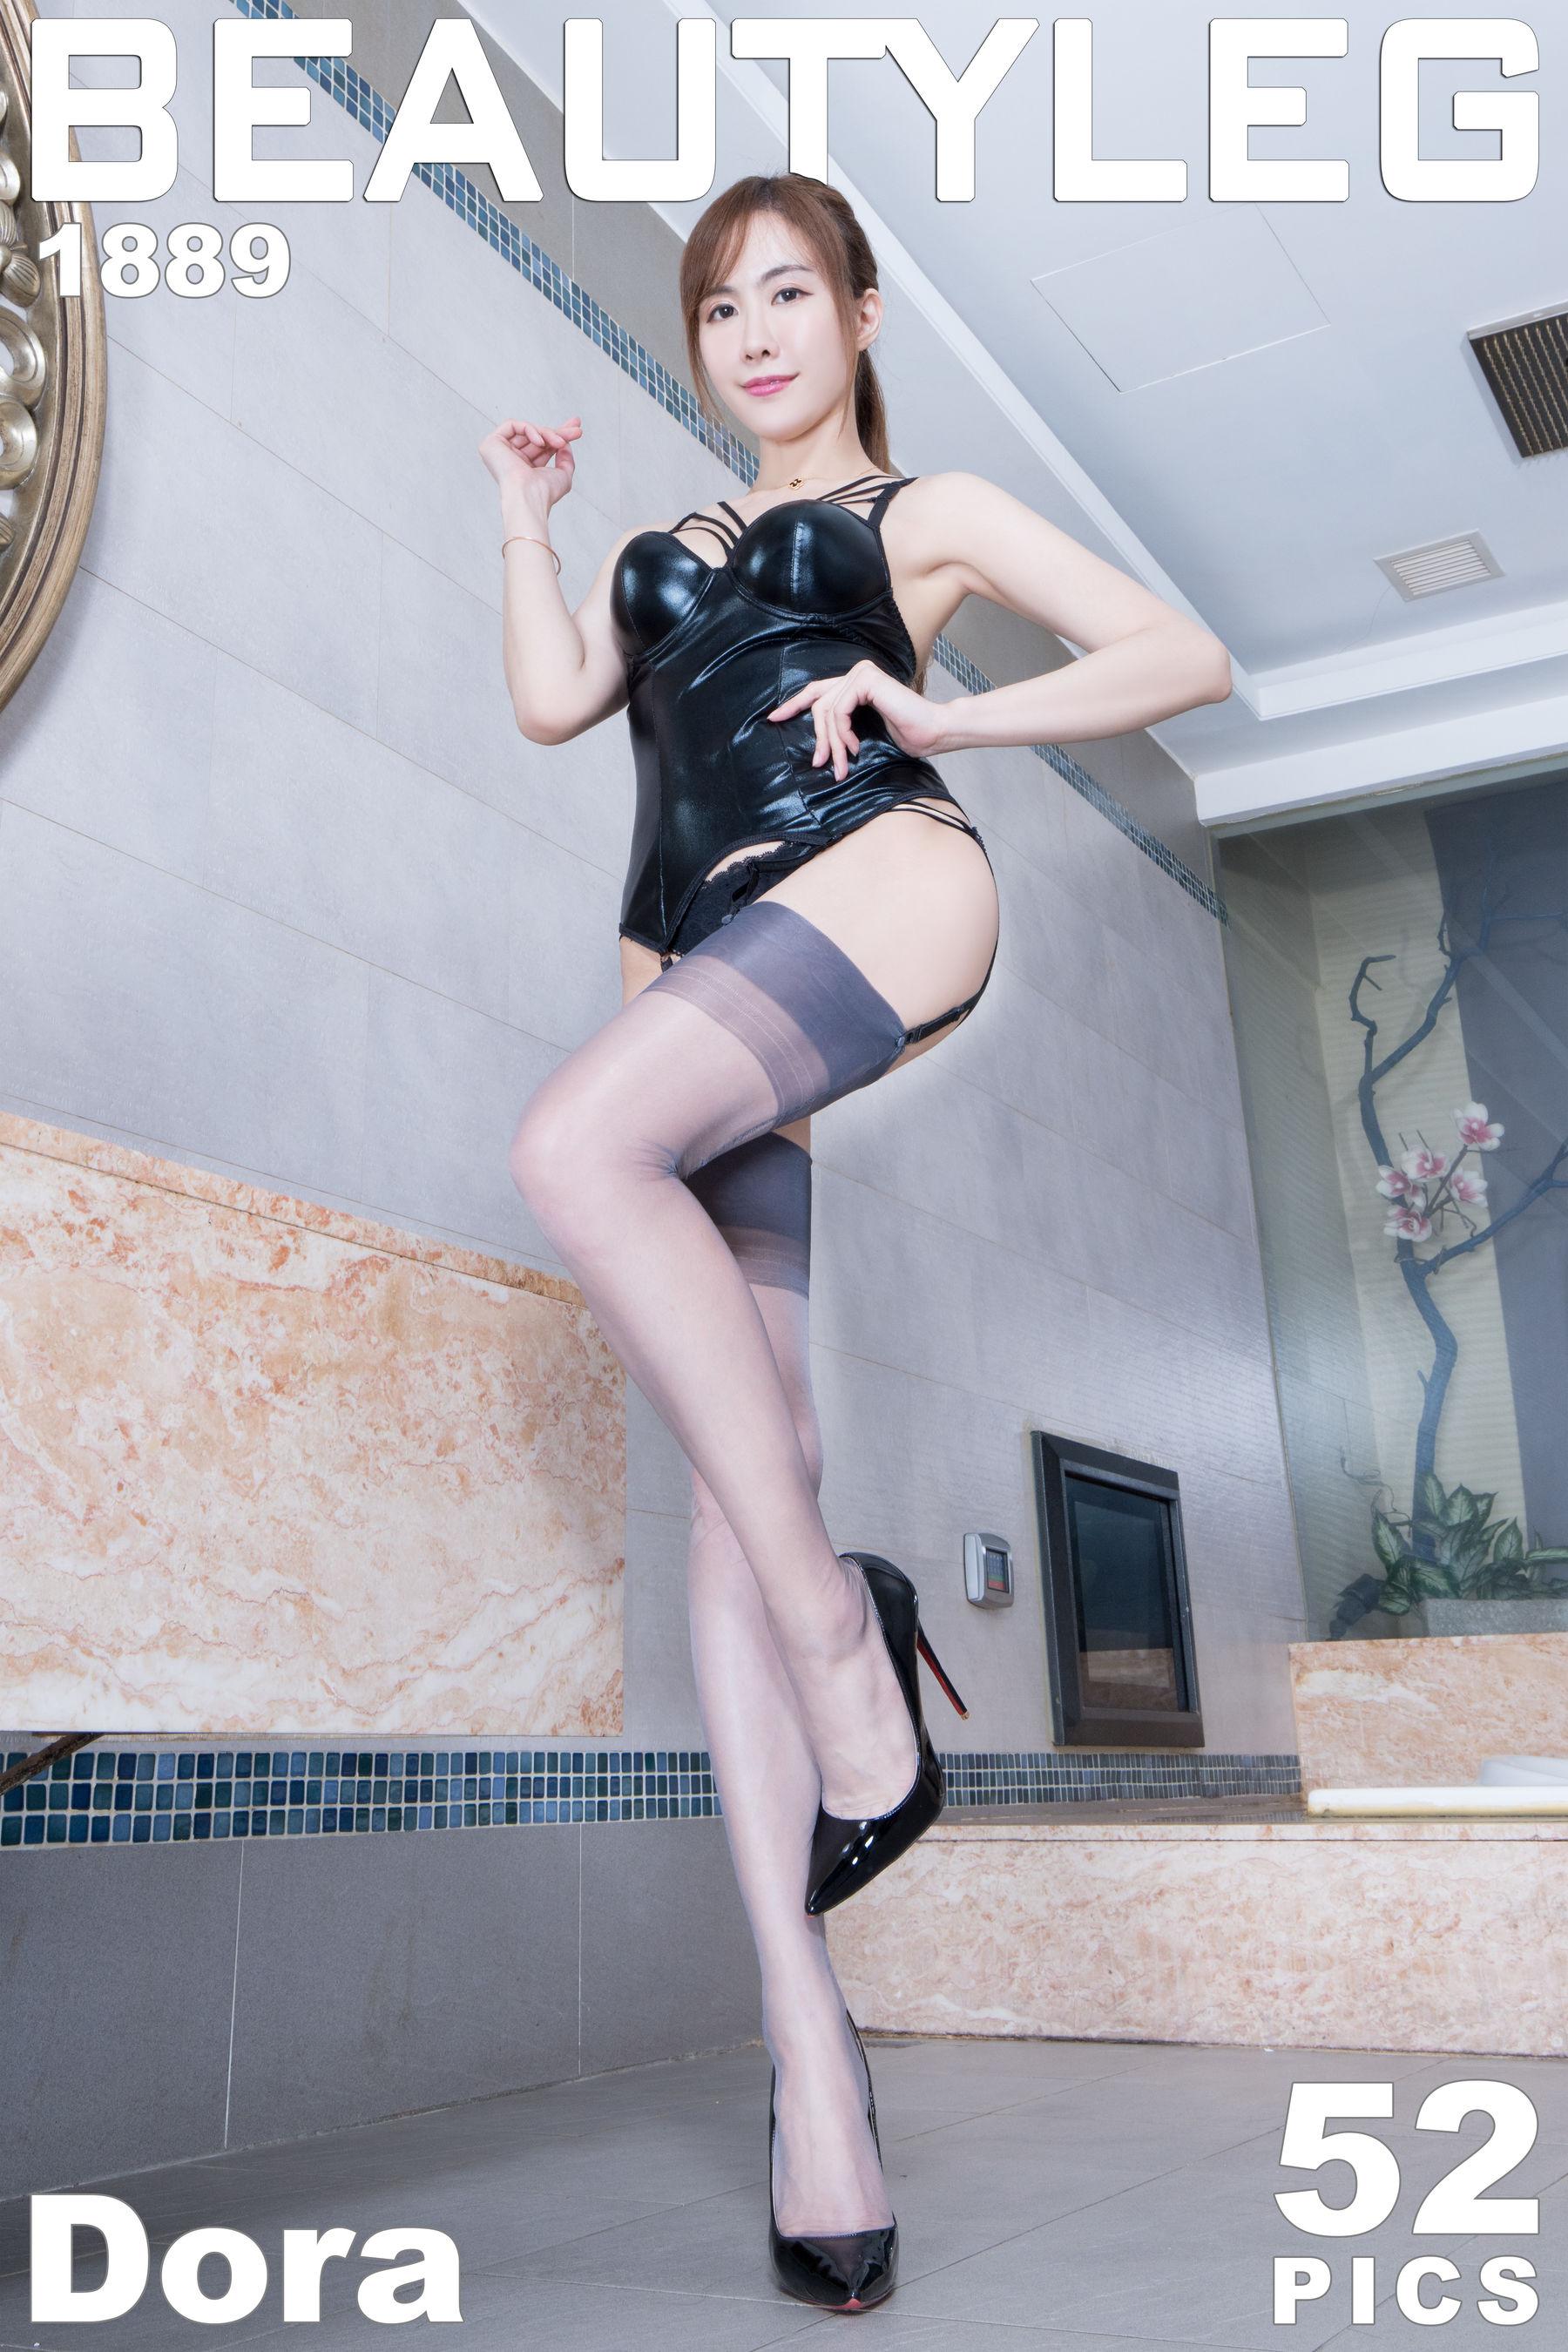 VOL.293 [Beautyleg]丝袜美腿长腿美女:曾妍希(腿模Dora)超高清个人性感漂亮大图(47P)